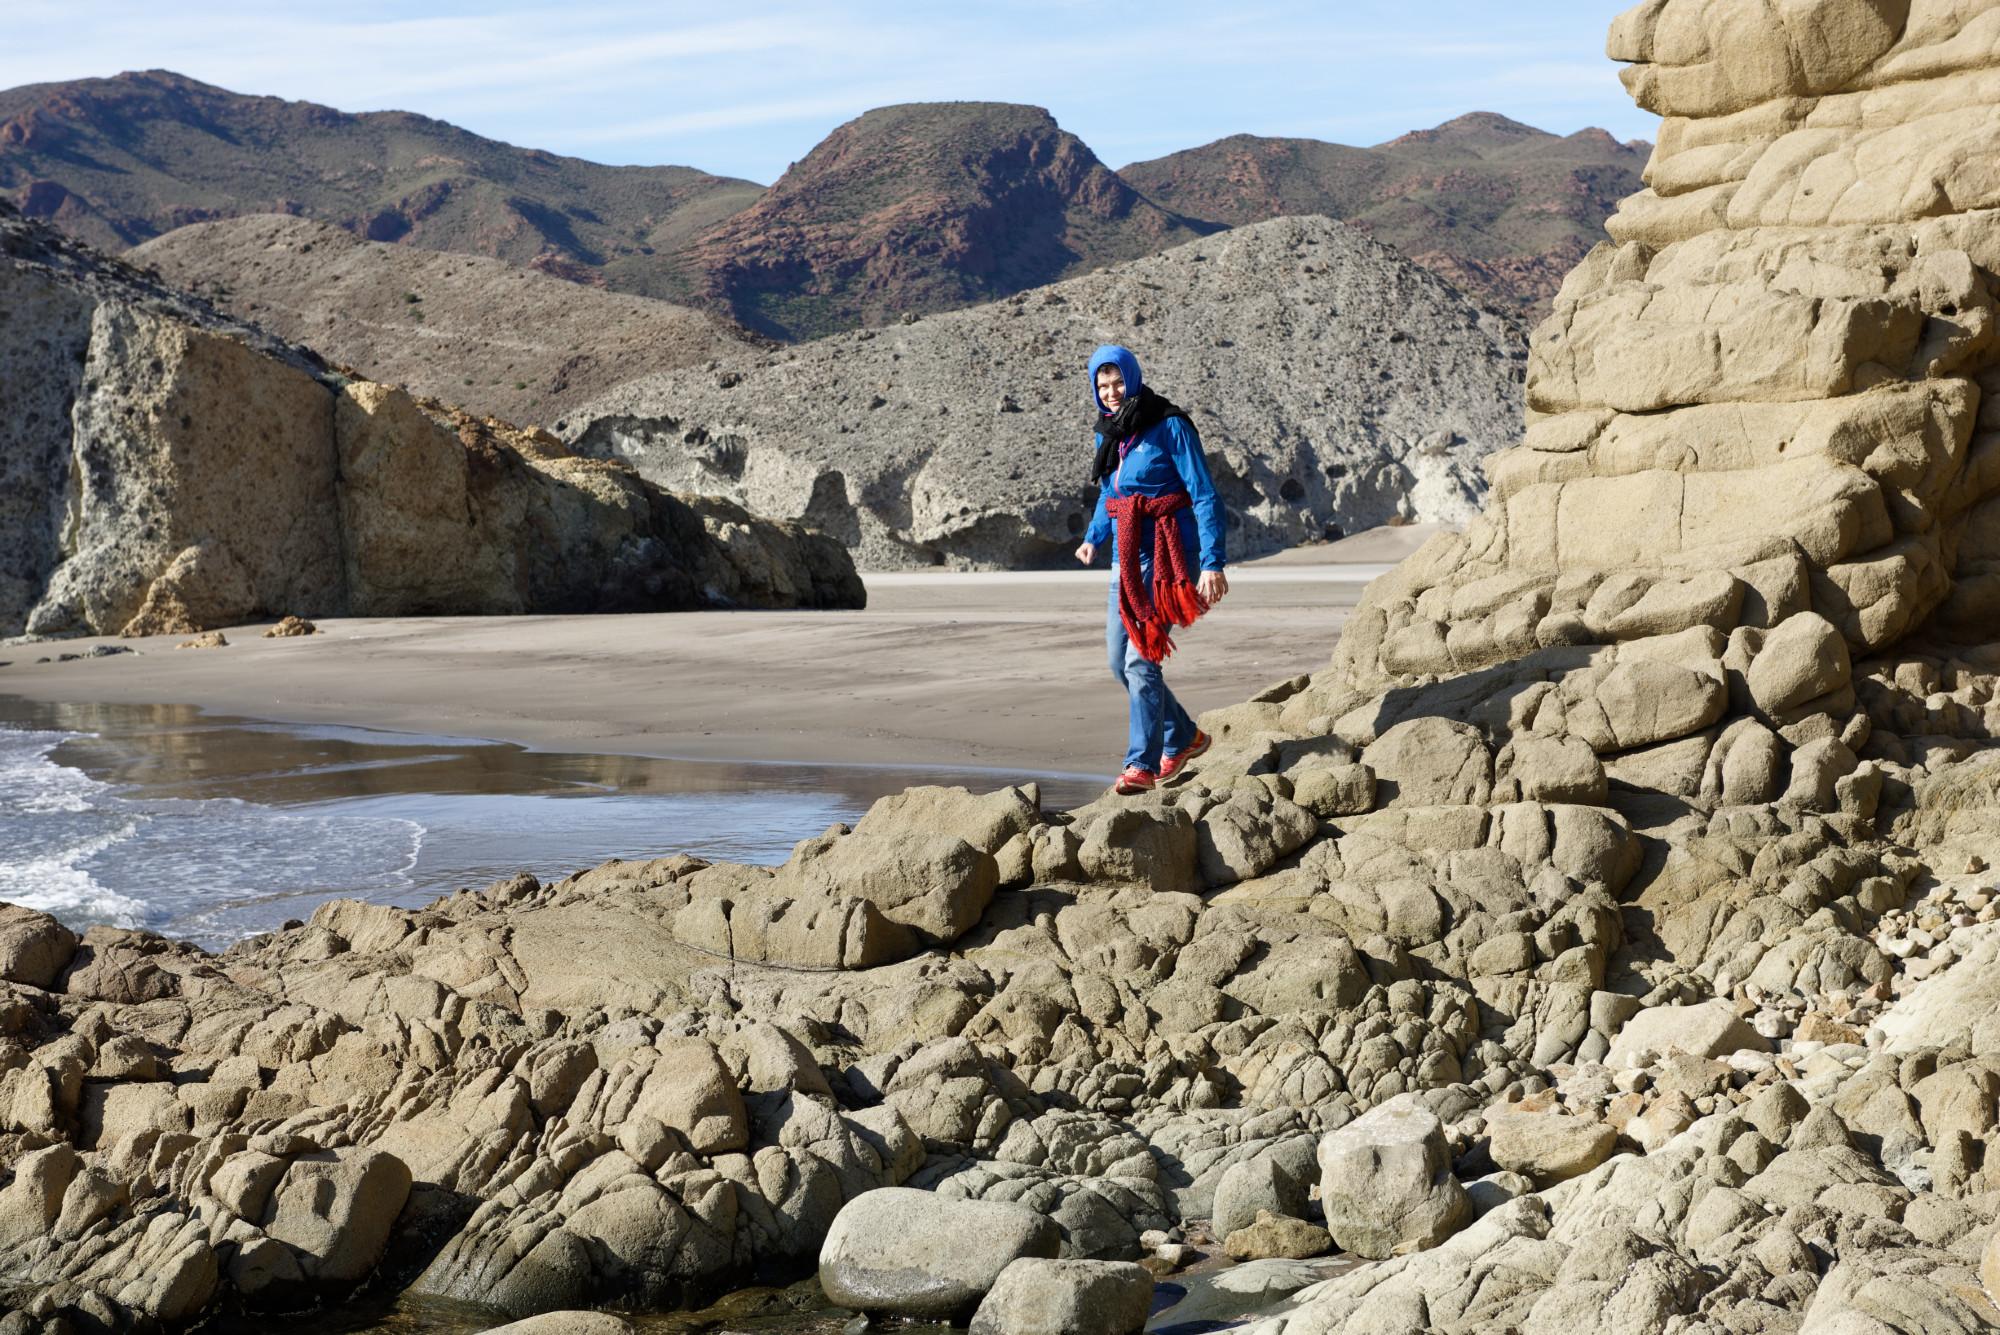 171214-San Jose-Playa del Monsul (Cabo de Gata-Andalousie) (191)